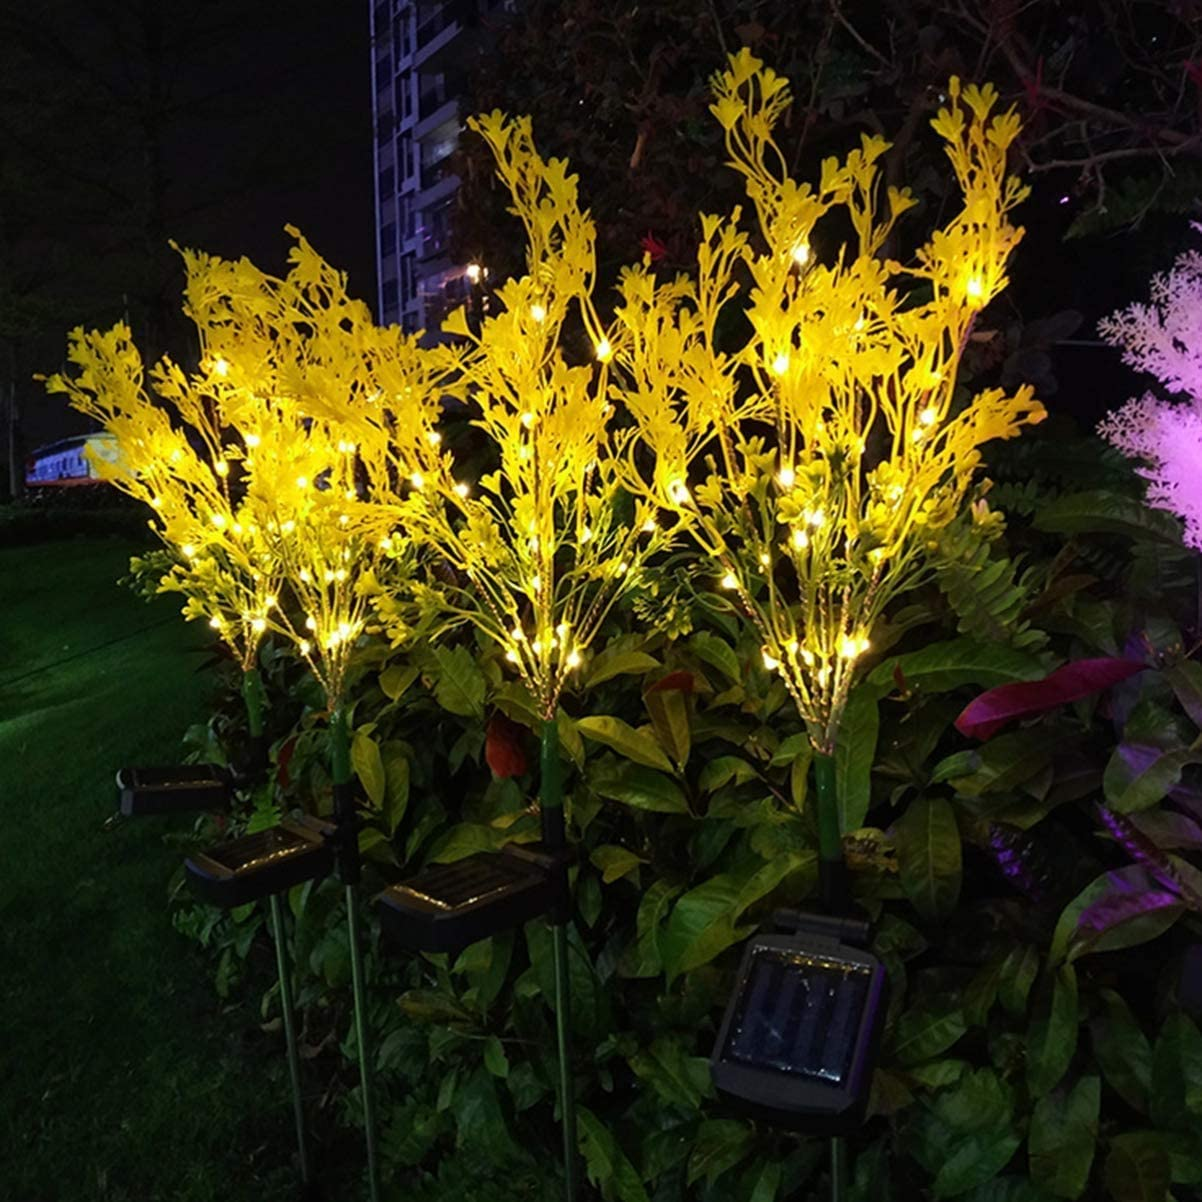 New Upgraded Solar Garden Lights Yellow Bigger Flower and Wider Solar Panel Solar String Lights 2 Pack Brighting Rape Solar Flower Lights for Patio,Yard Decoration Solar Lights Outdoor